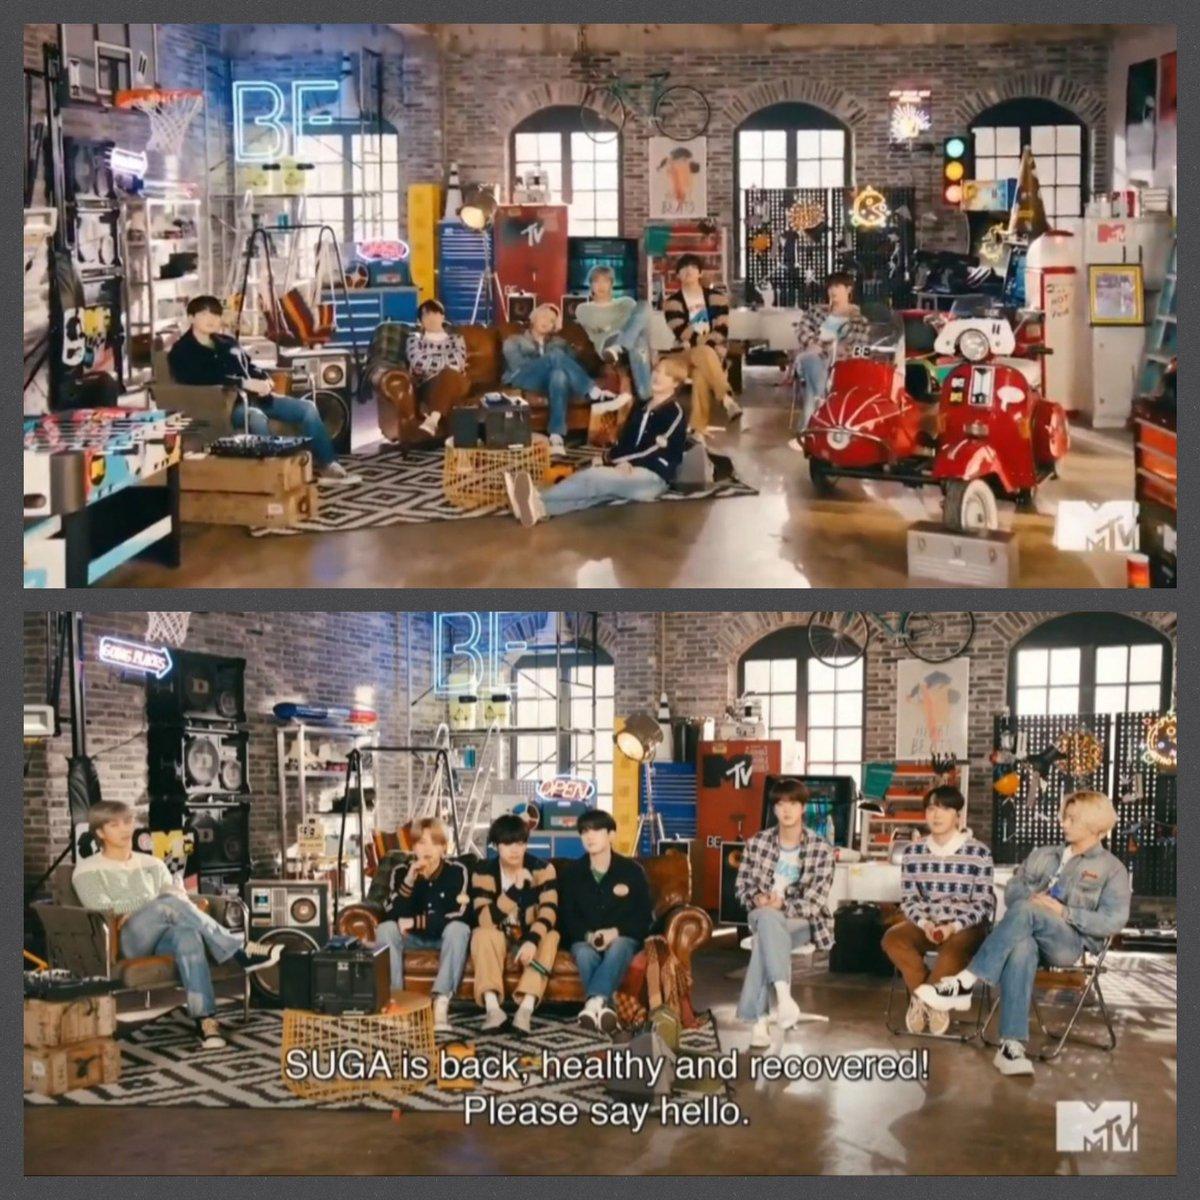 #MTVUnplugged #BTS (21.02.24 11am KST)  아름다운 #방탄소년단 🤍🤍🤍 (@BTS_twt) 의 무대모습💜💜💜  Telepathy Blue&Grey Fix you (Coldplay cover) Life Goes On Dynamite  #BTSonMTV #7방탄완전소중 #역시방탄 #방부심 #내가수최고 #가슴이웅장해지는셋리